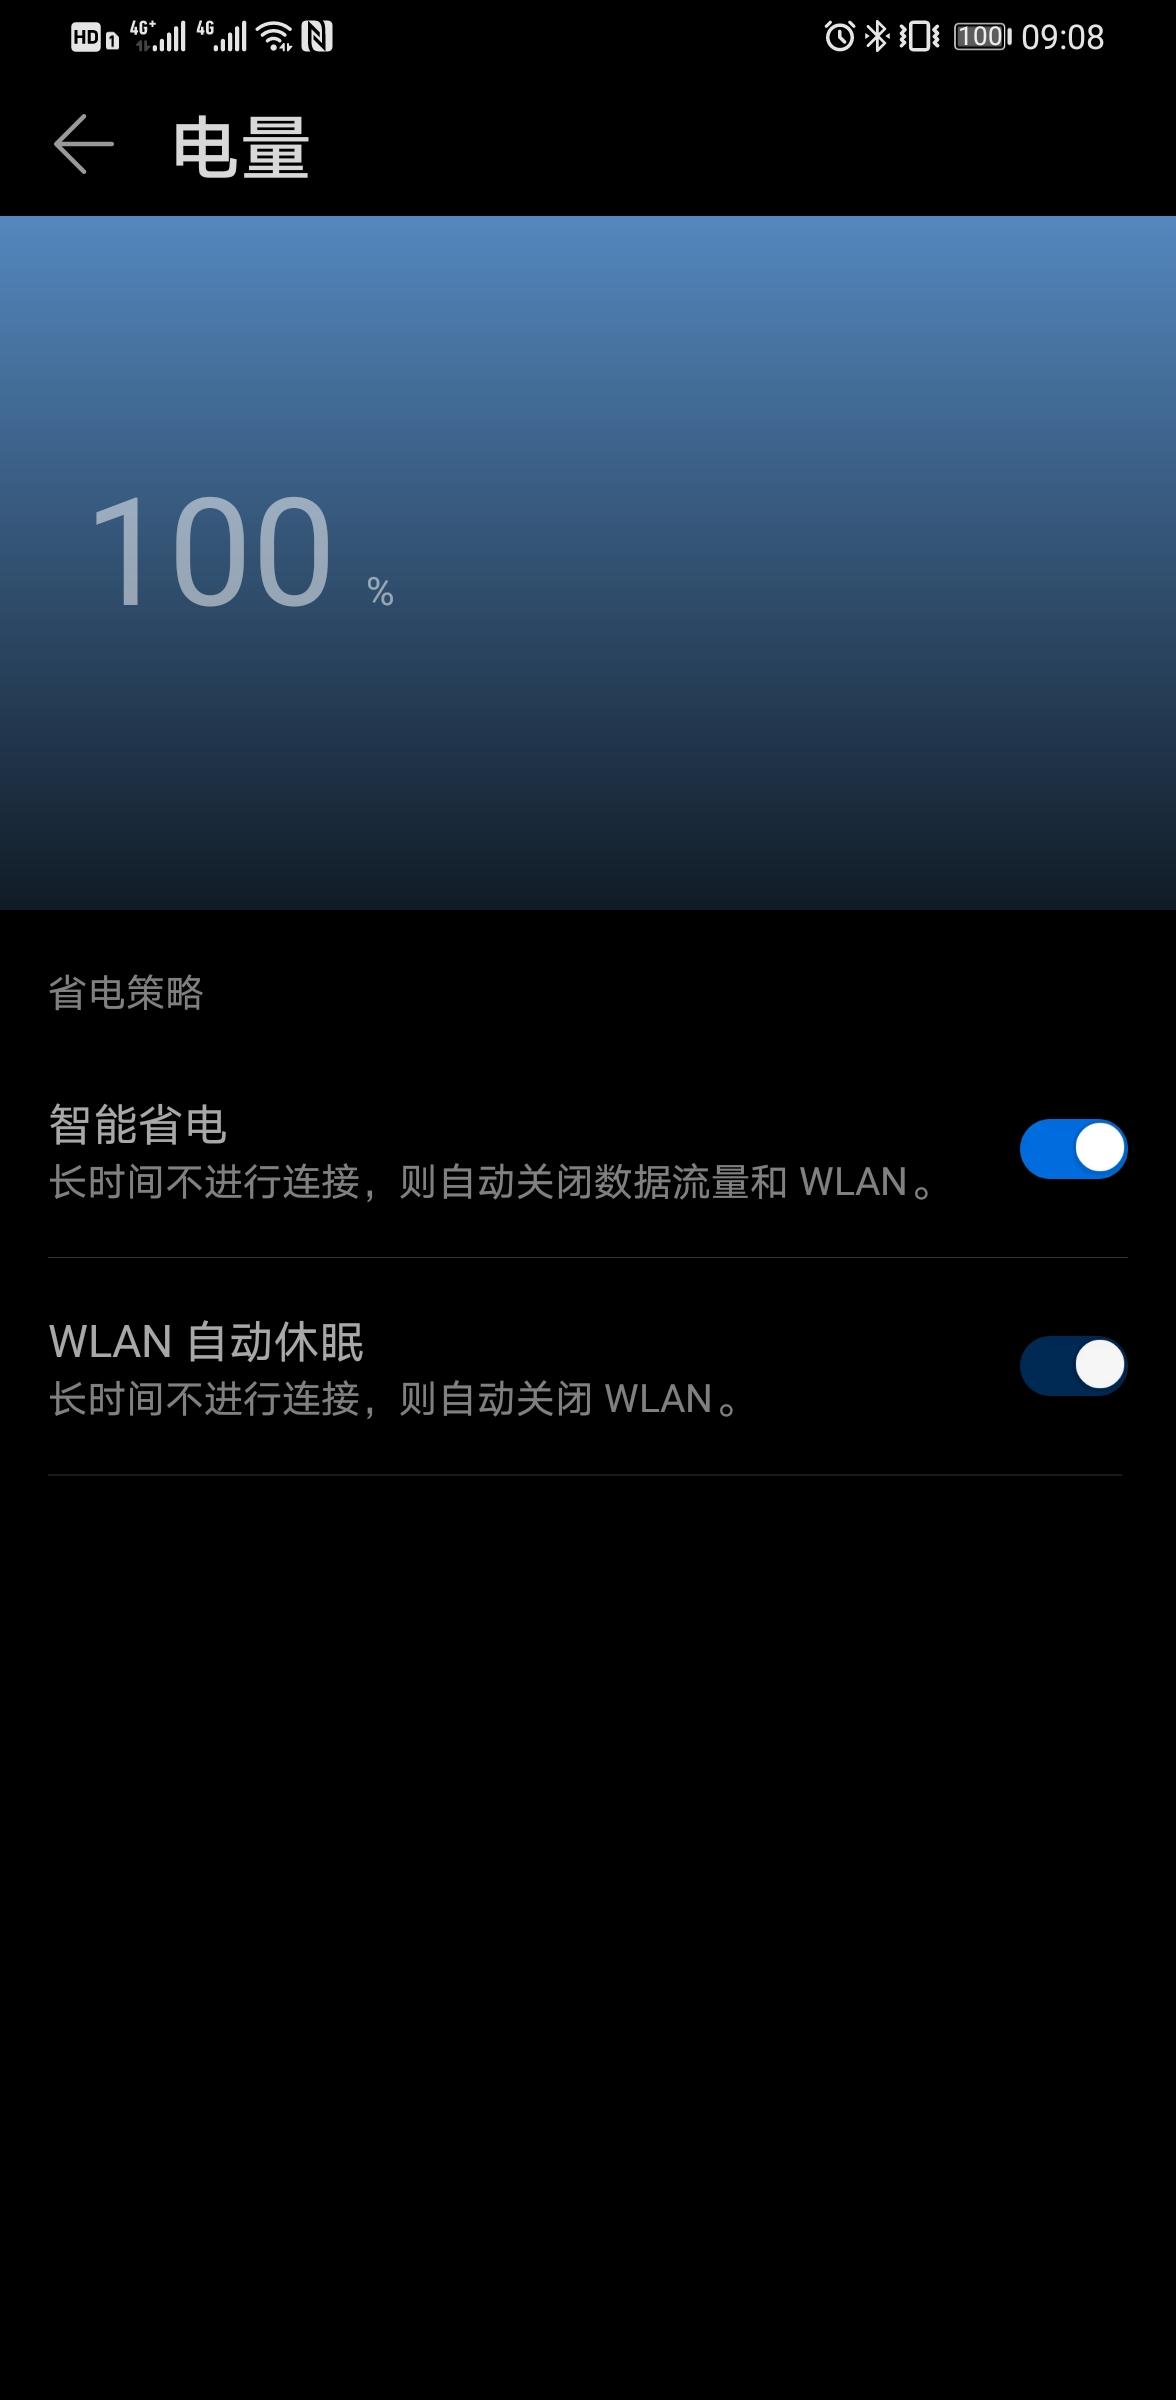 Screenshot_20200317_090840_com.huawei.smarthome.jpg